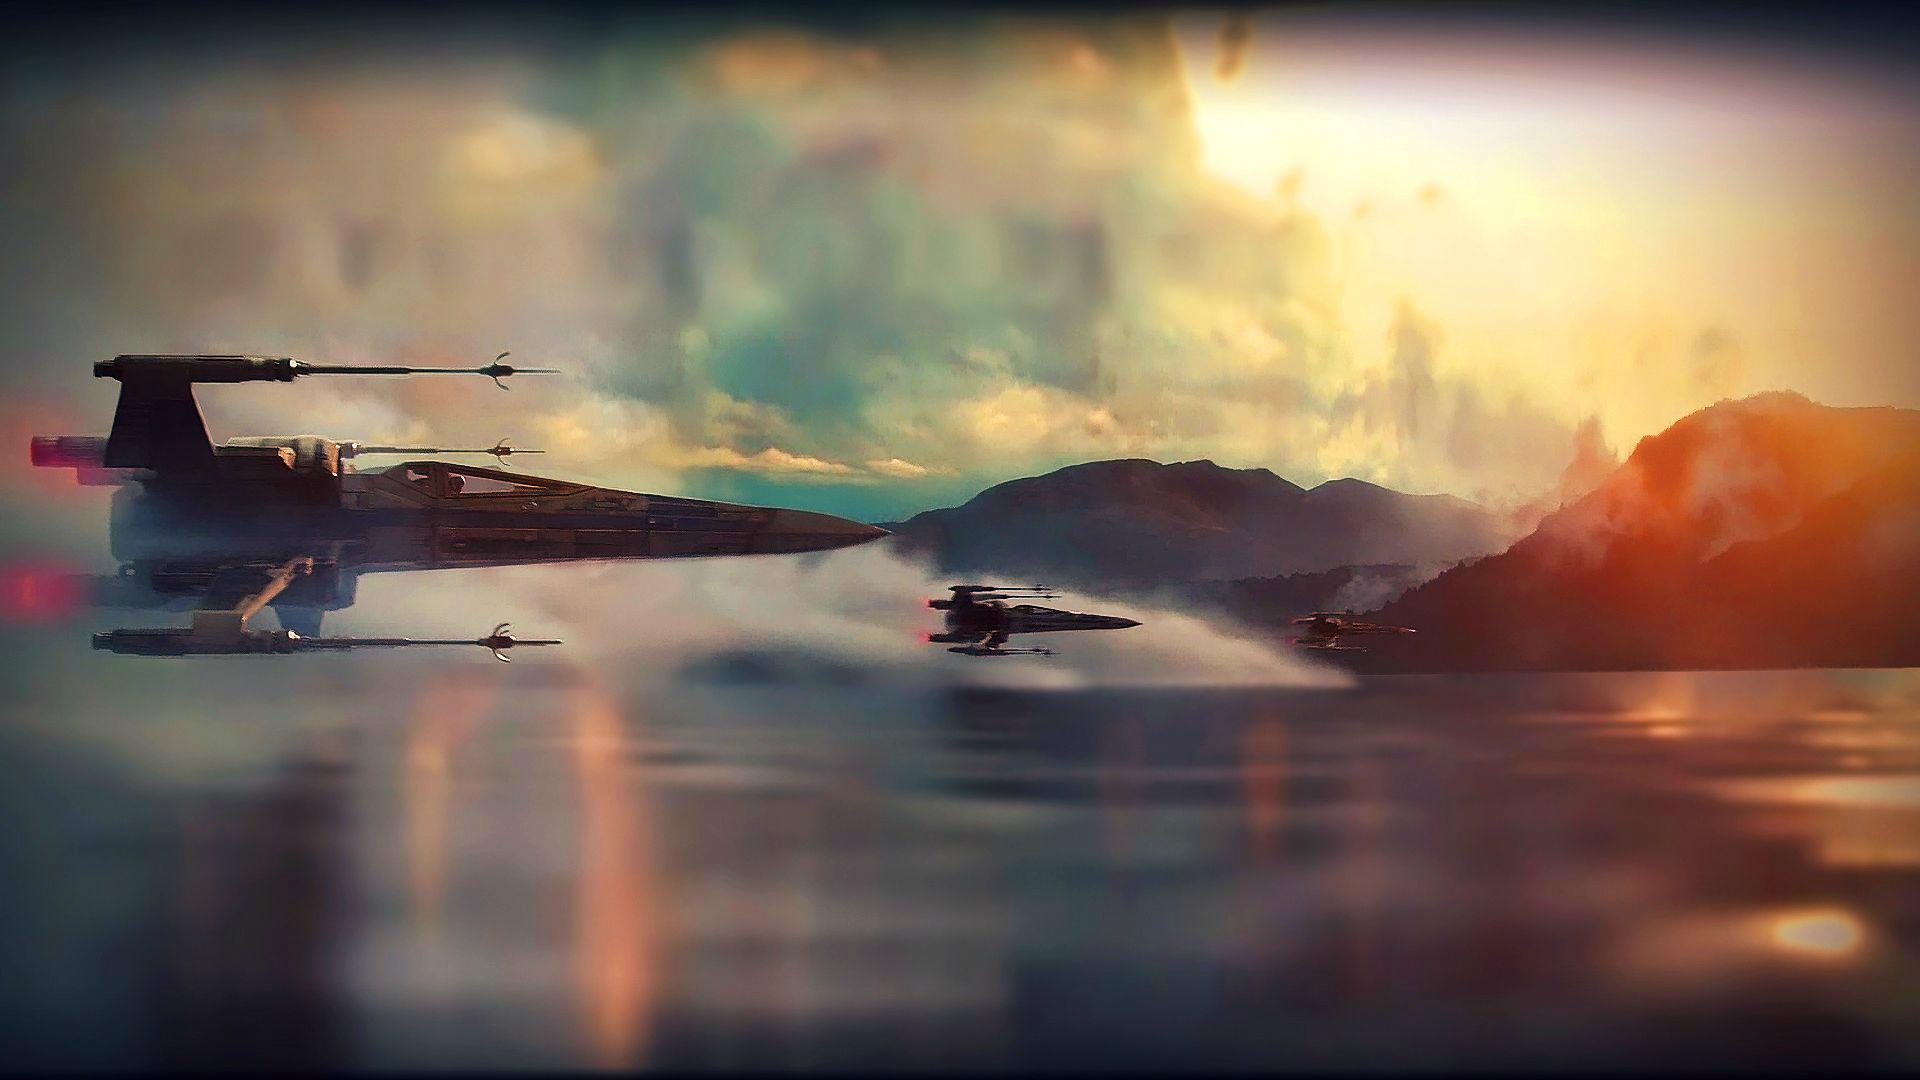 Star Wars Wallpaper Dump - 1080p - Album on Imgur